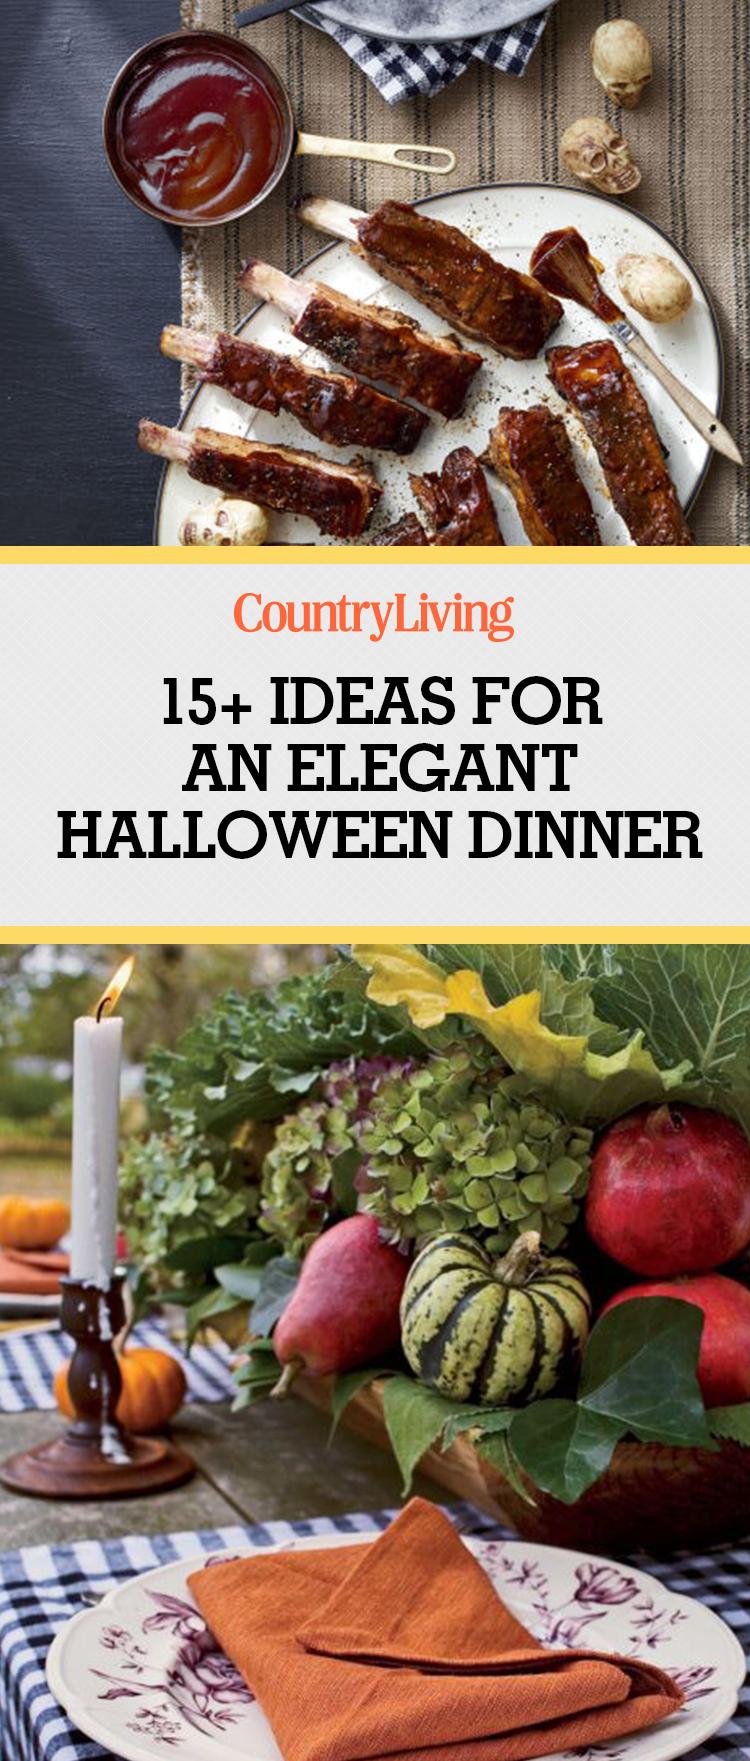 19 halloween dinner ideas menu for halloween dinner party. Black Bedroom Furniture Sets. Home Design Ideas